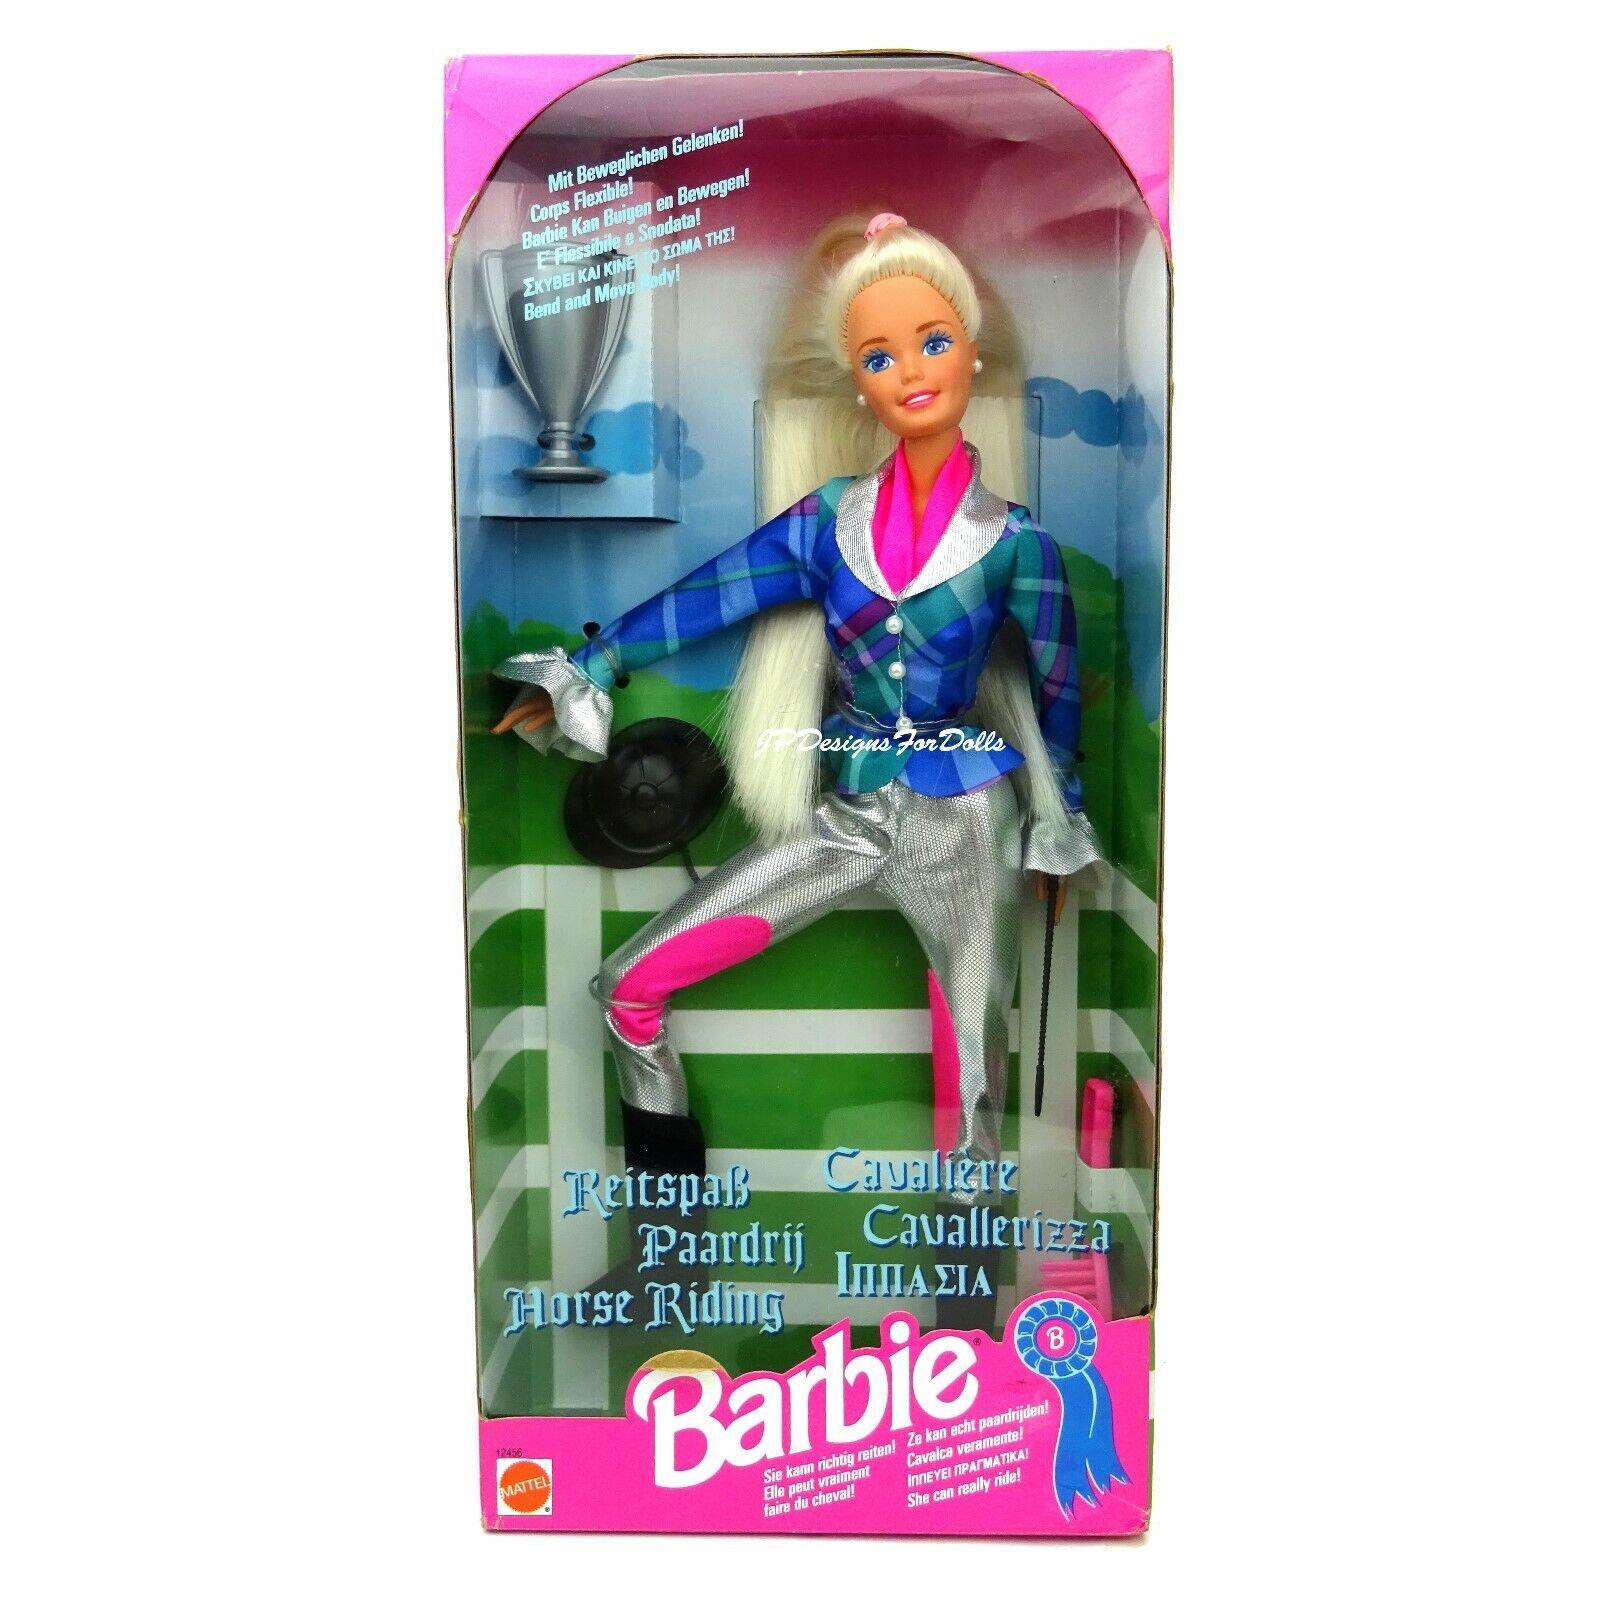 1994 Cavaliere Horse Riding Barbie Doll European Issue